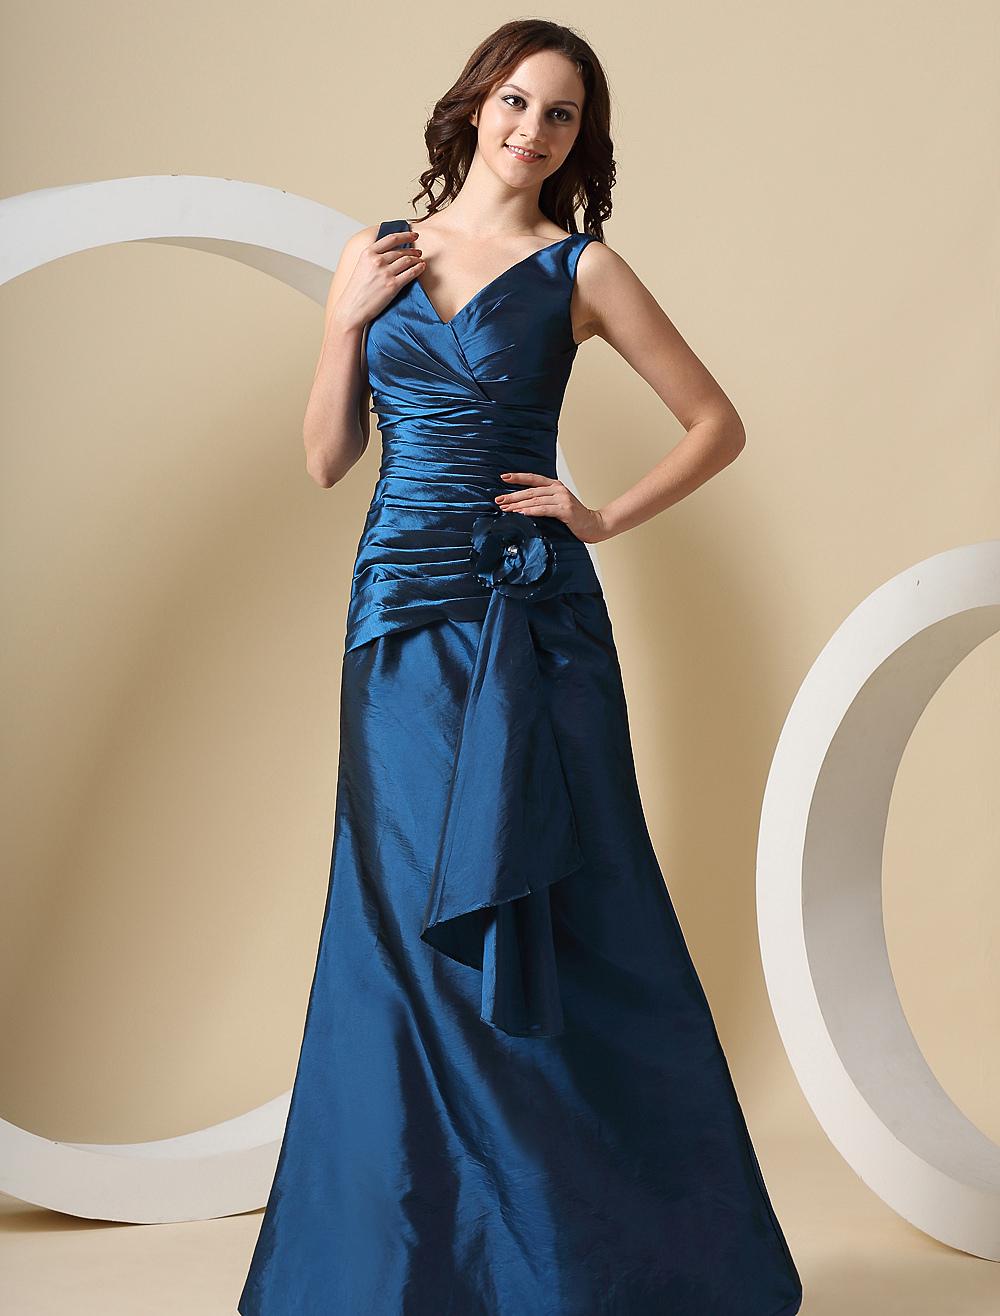 Mermaid Bridesmaid Dress Ink Blue V Neckline Ruched Flowers Taffeta Maxi Party Dress